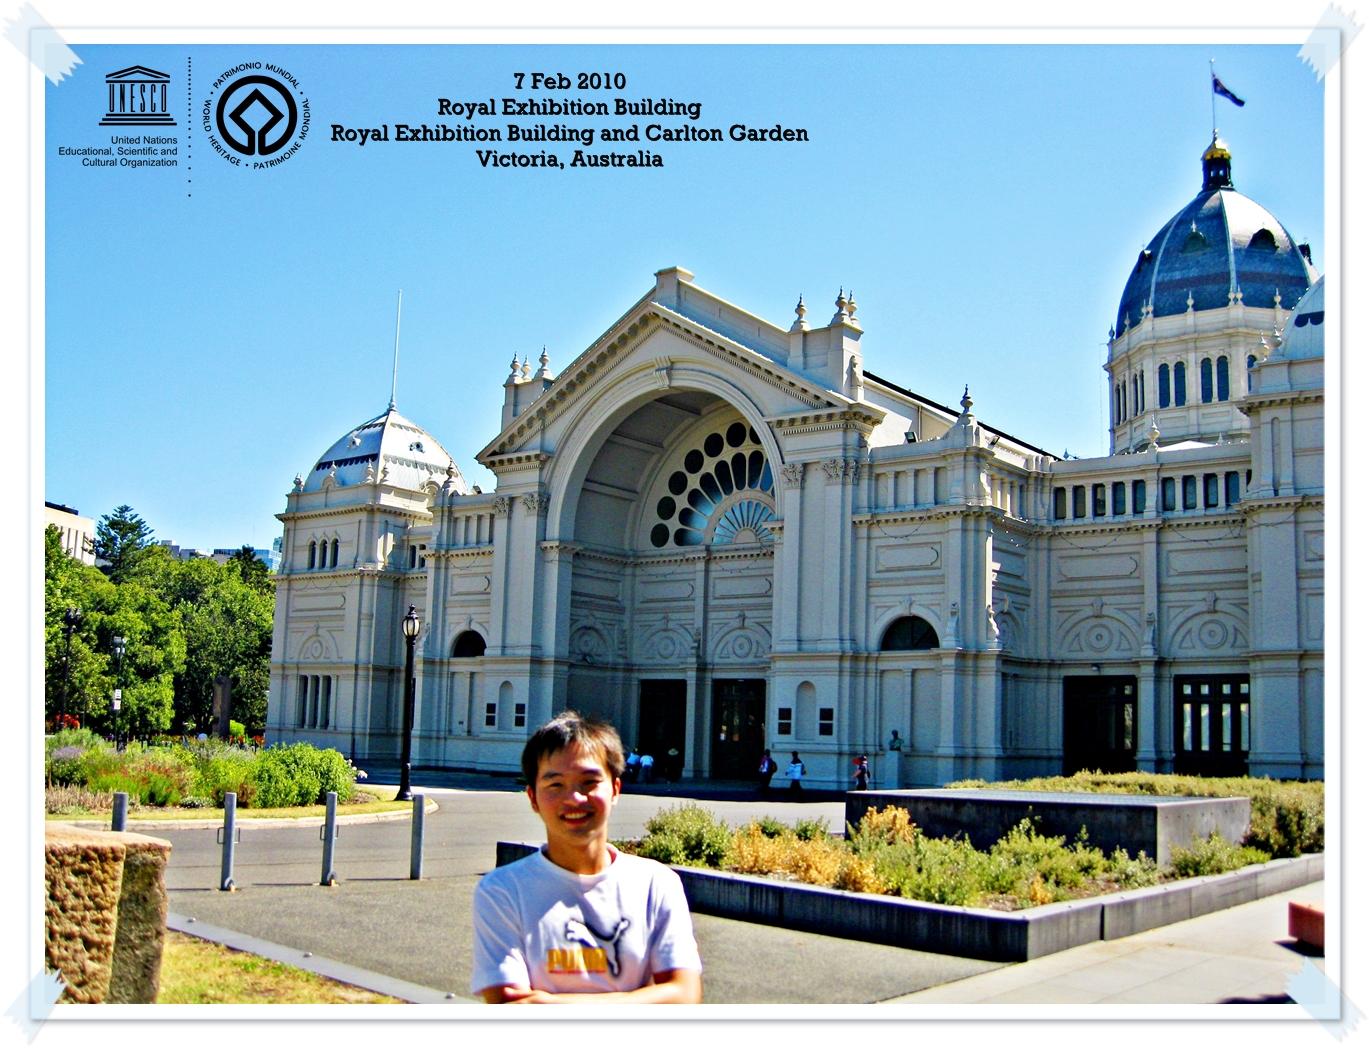 Royal Exhibition Building and Carlton Gardens - Australia By Thomas shaw